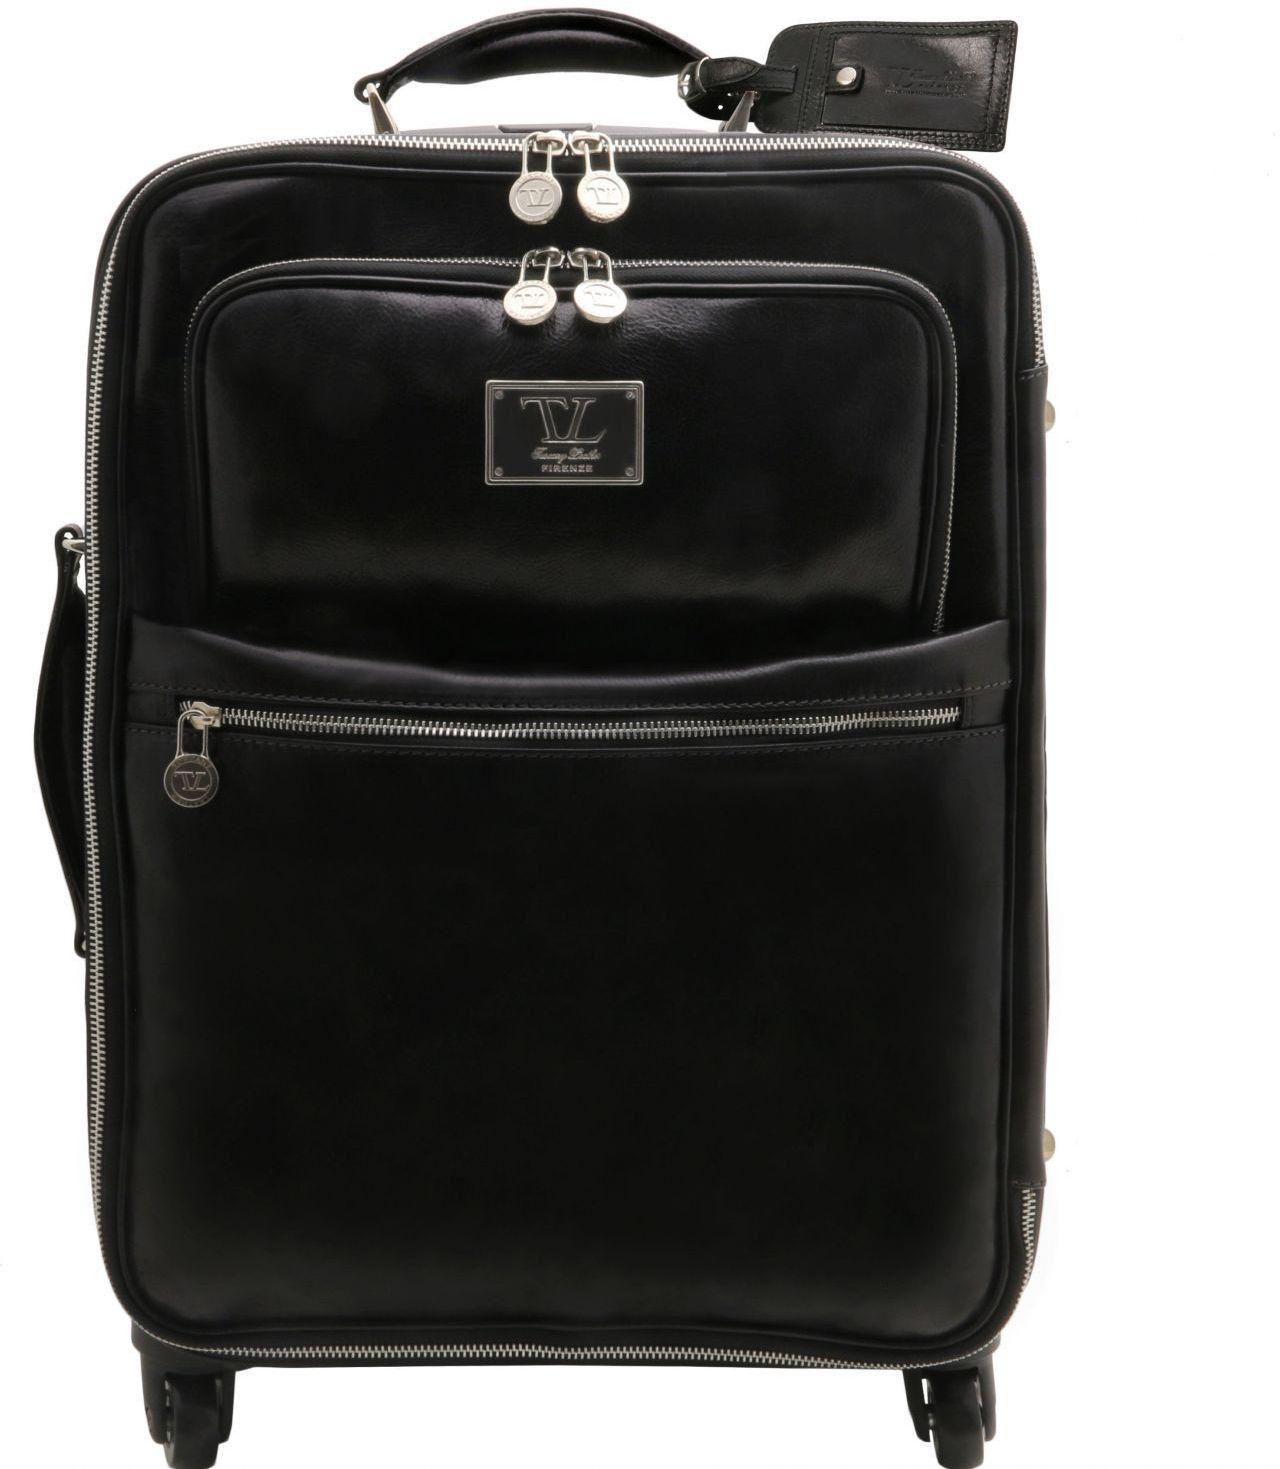 0ba4a41ebc Bagz Βαλίτσα Δερμάτινη με ροδάκια (Trolley) TL141390 (35.5 x 46 x 21) Μαύρο